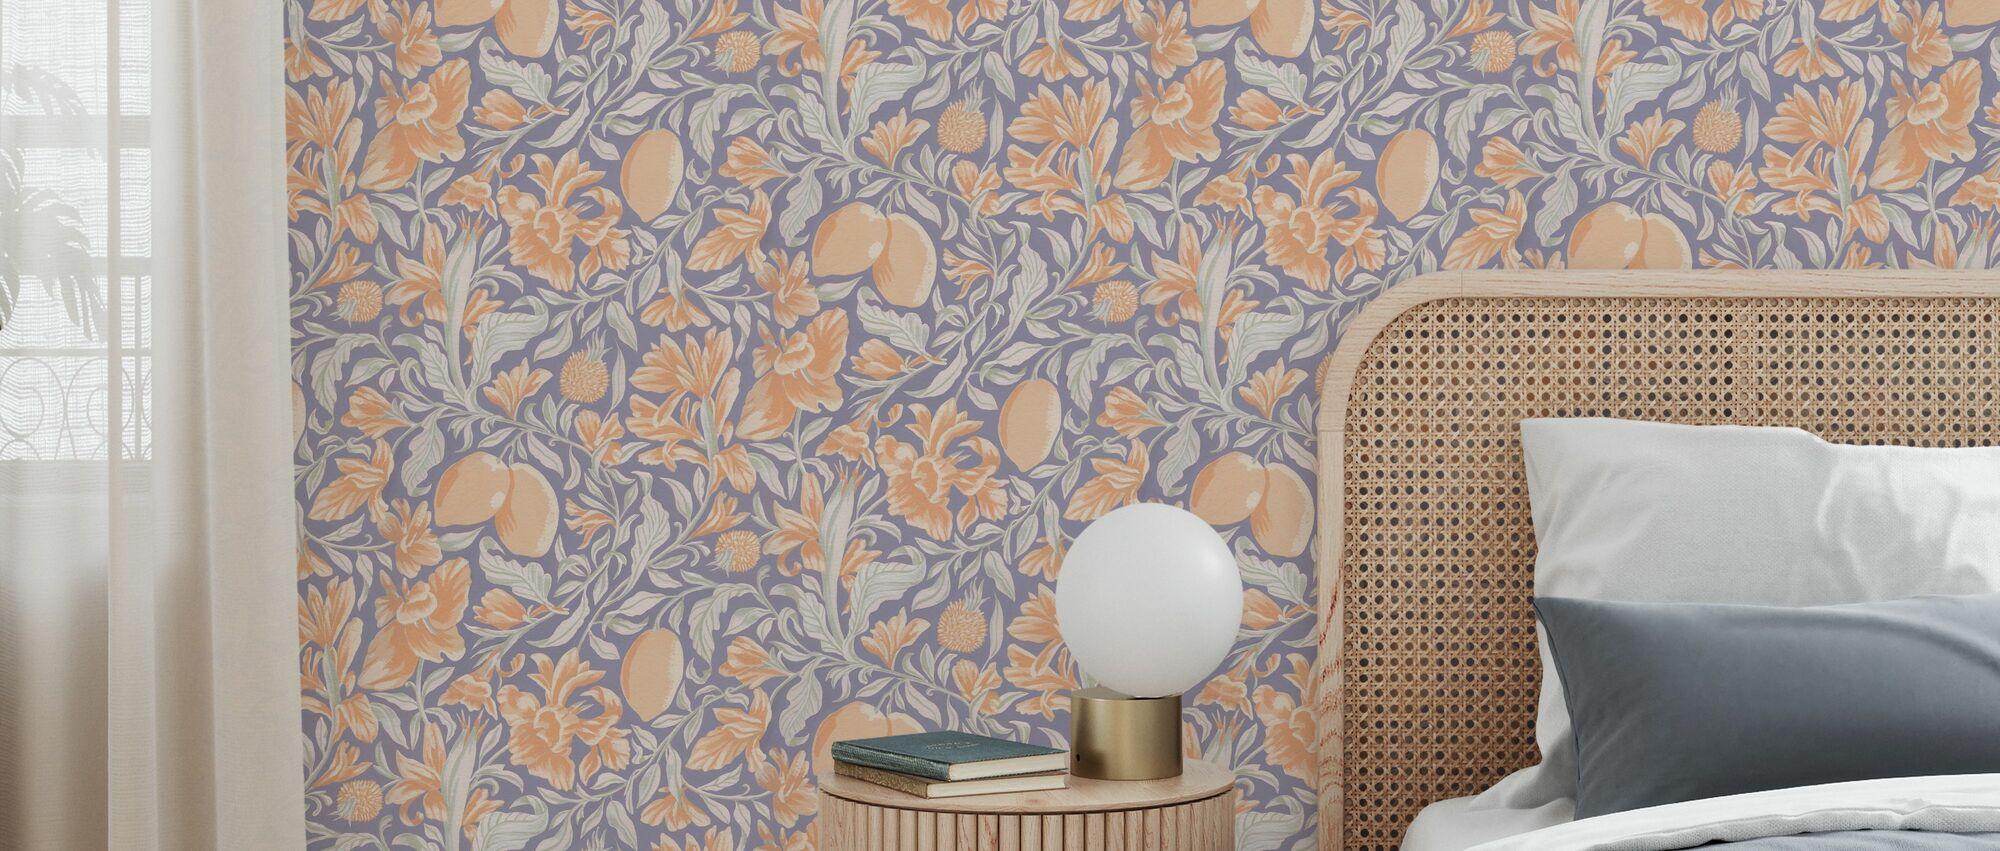 Blooming Citrus - Fragrant - Wallpaper - Bedroom